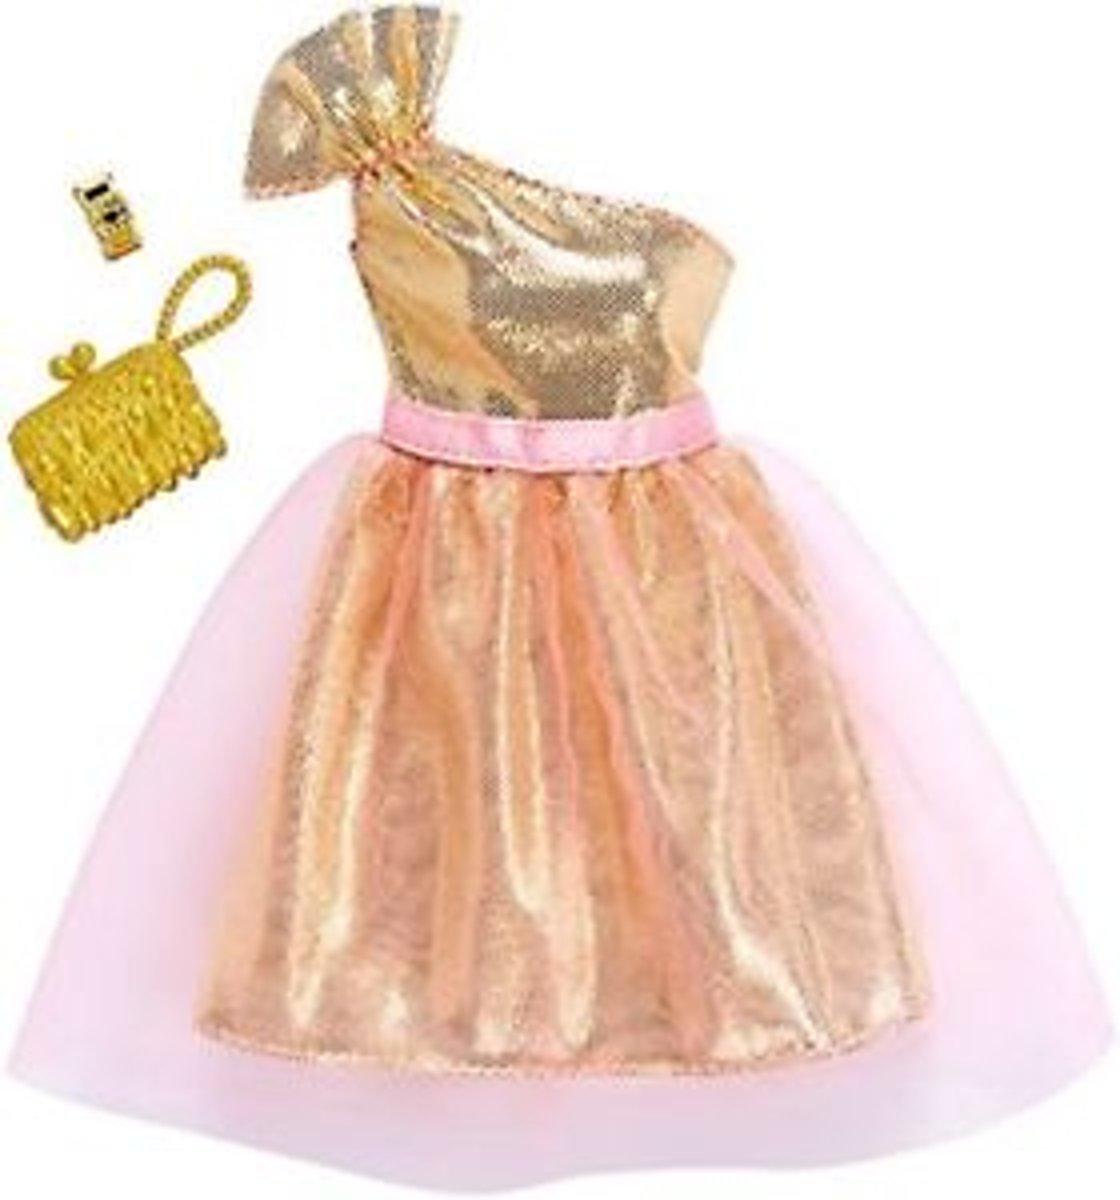 Barbie Outfit - Gouden Glitter Jurk + Accessoires